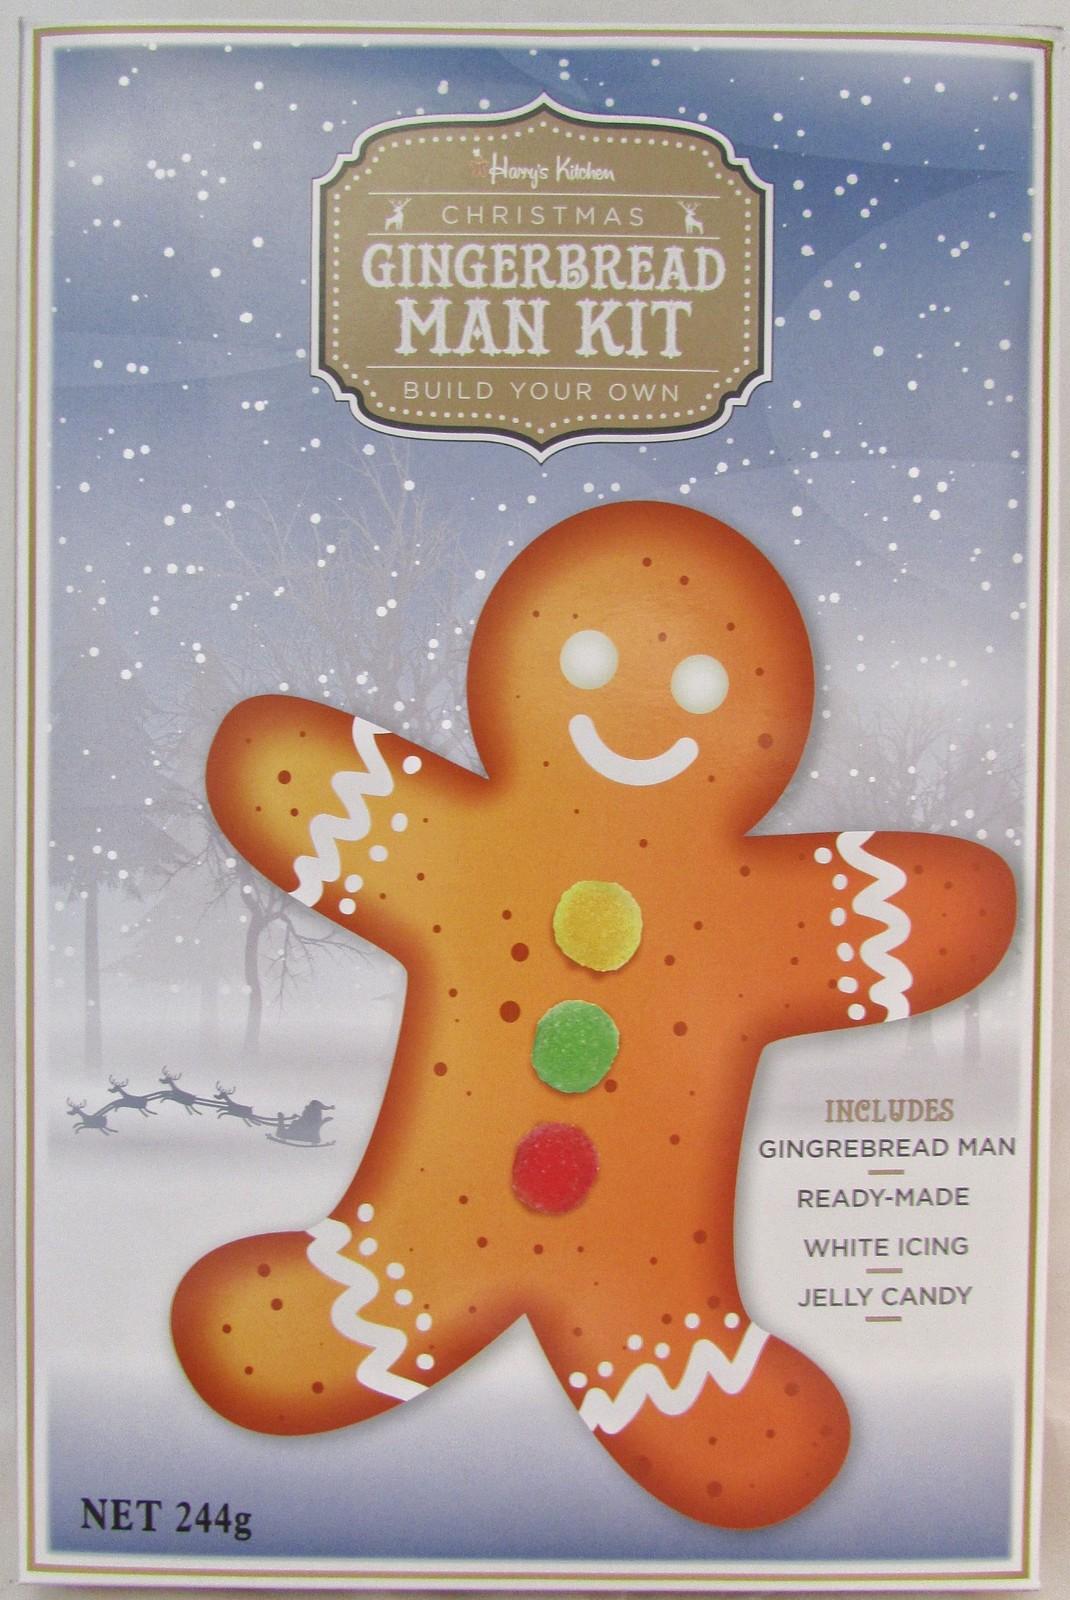 Gingerbread Man Make Your Own Kit (244g) image